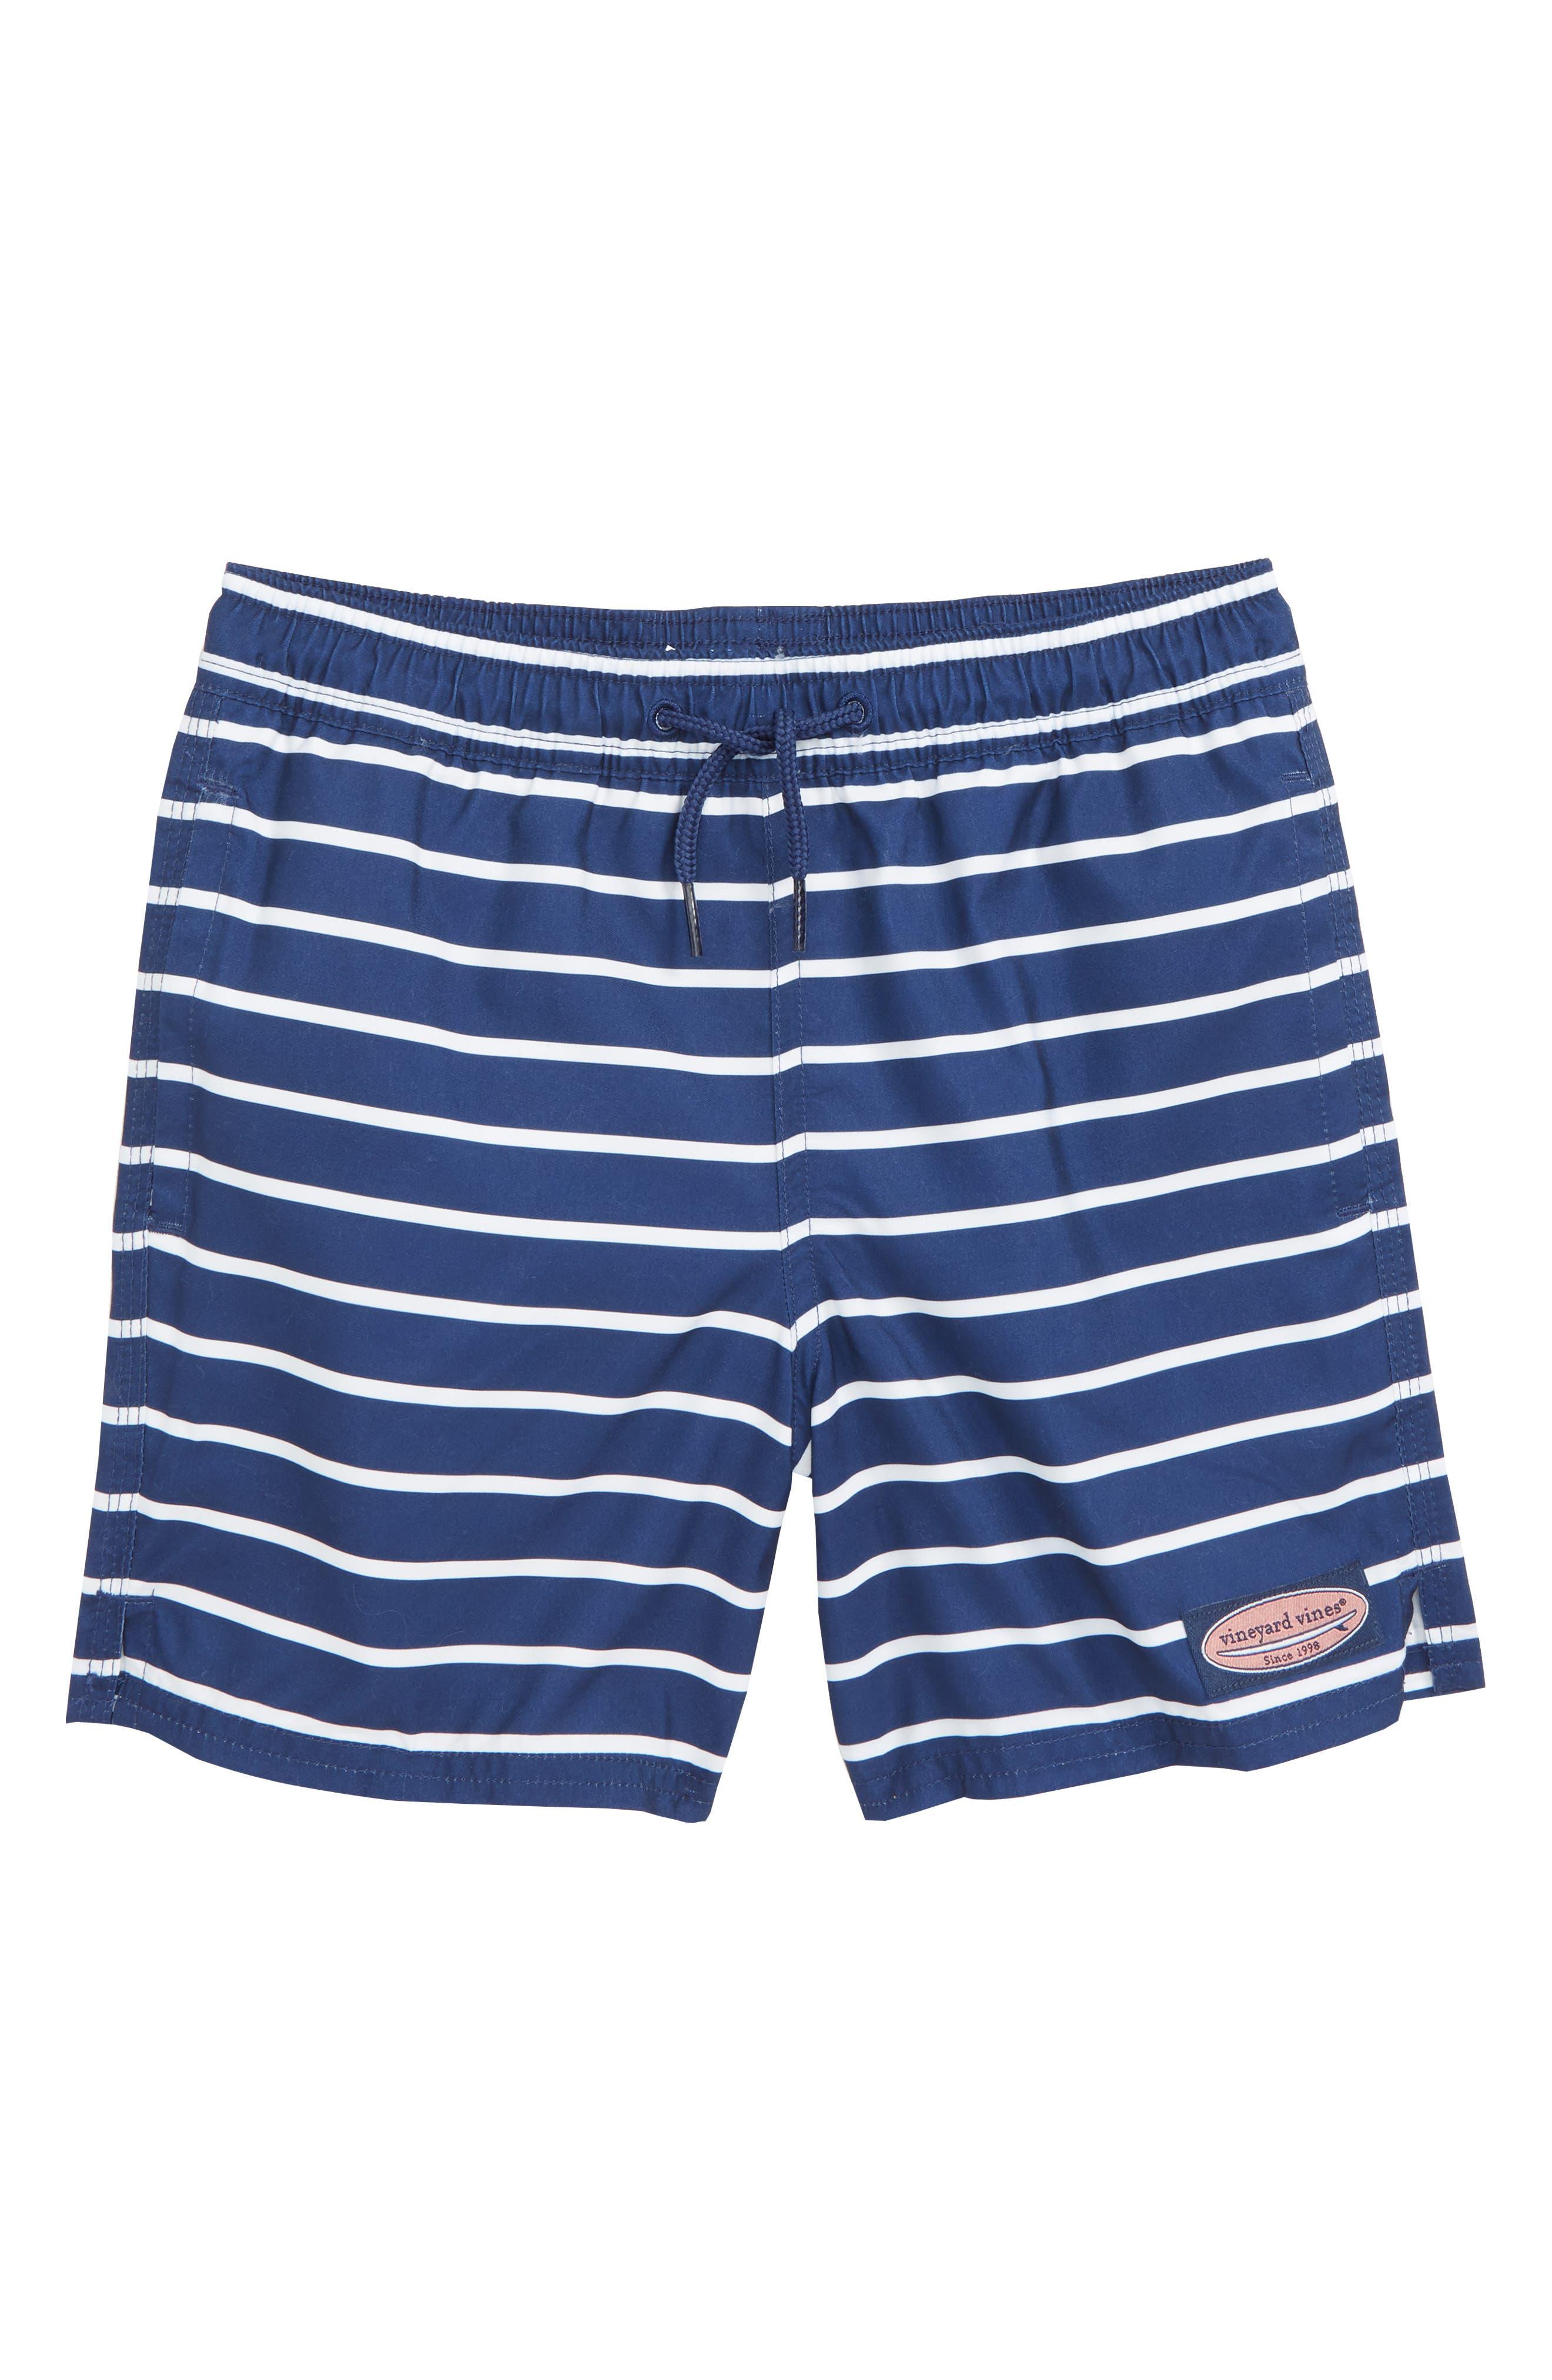 VINEYARD VINES Break Stripe Chappy Swim Trunks, Main, color, DEEP BAY